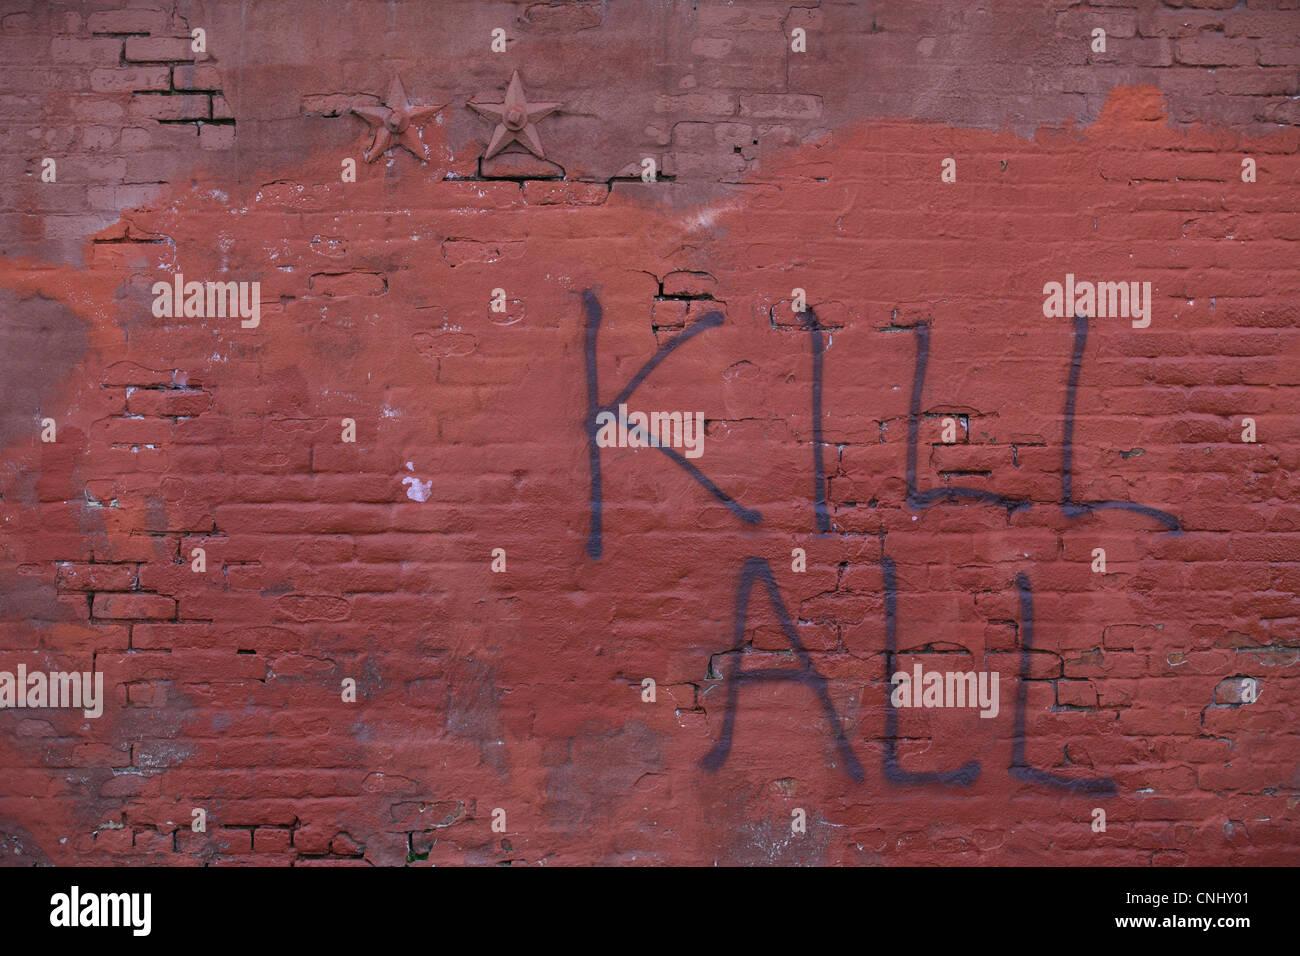 Grafiti wall red - Violent Hateful Graffiti Incitement To Violence Or Murder Kill All Written On Red Wall In Williamsburg Brooklyn Nyc Usa